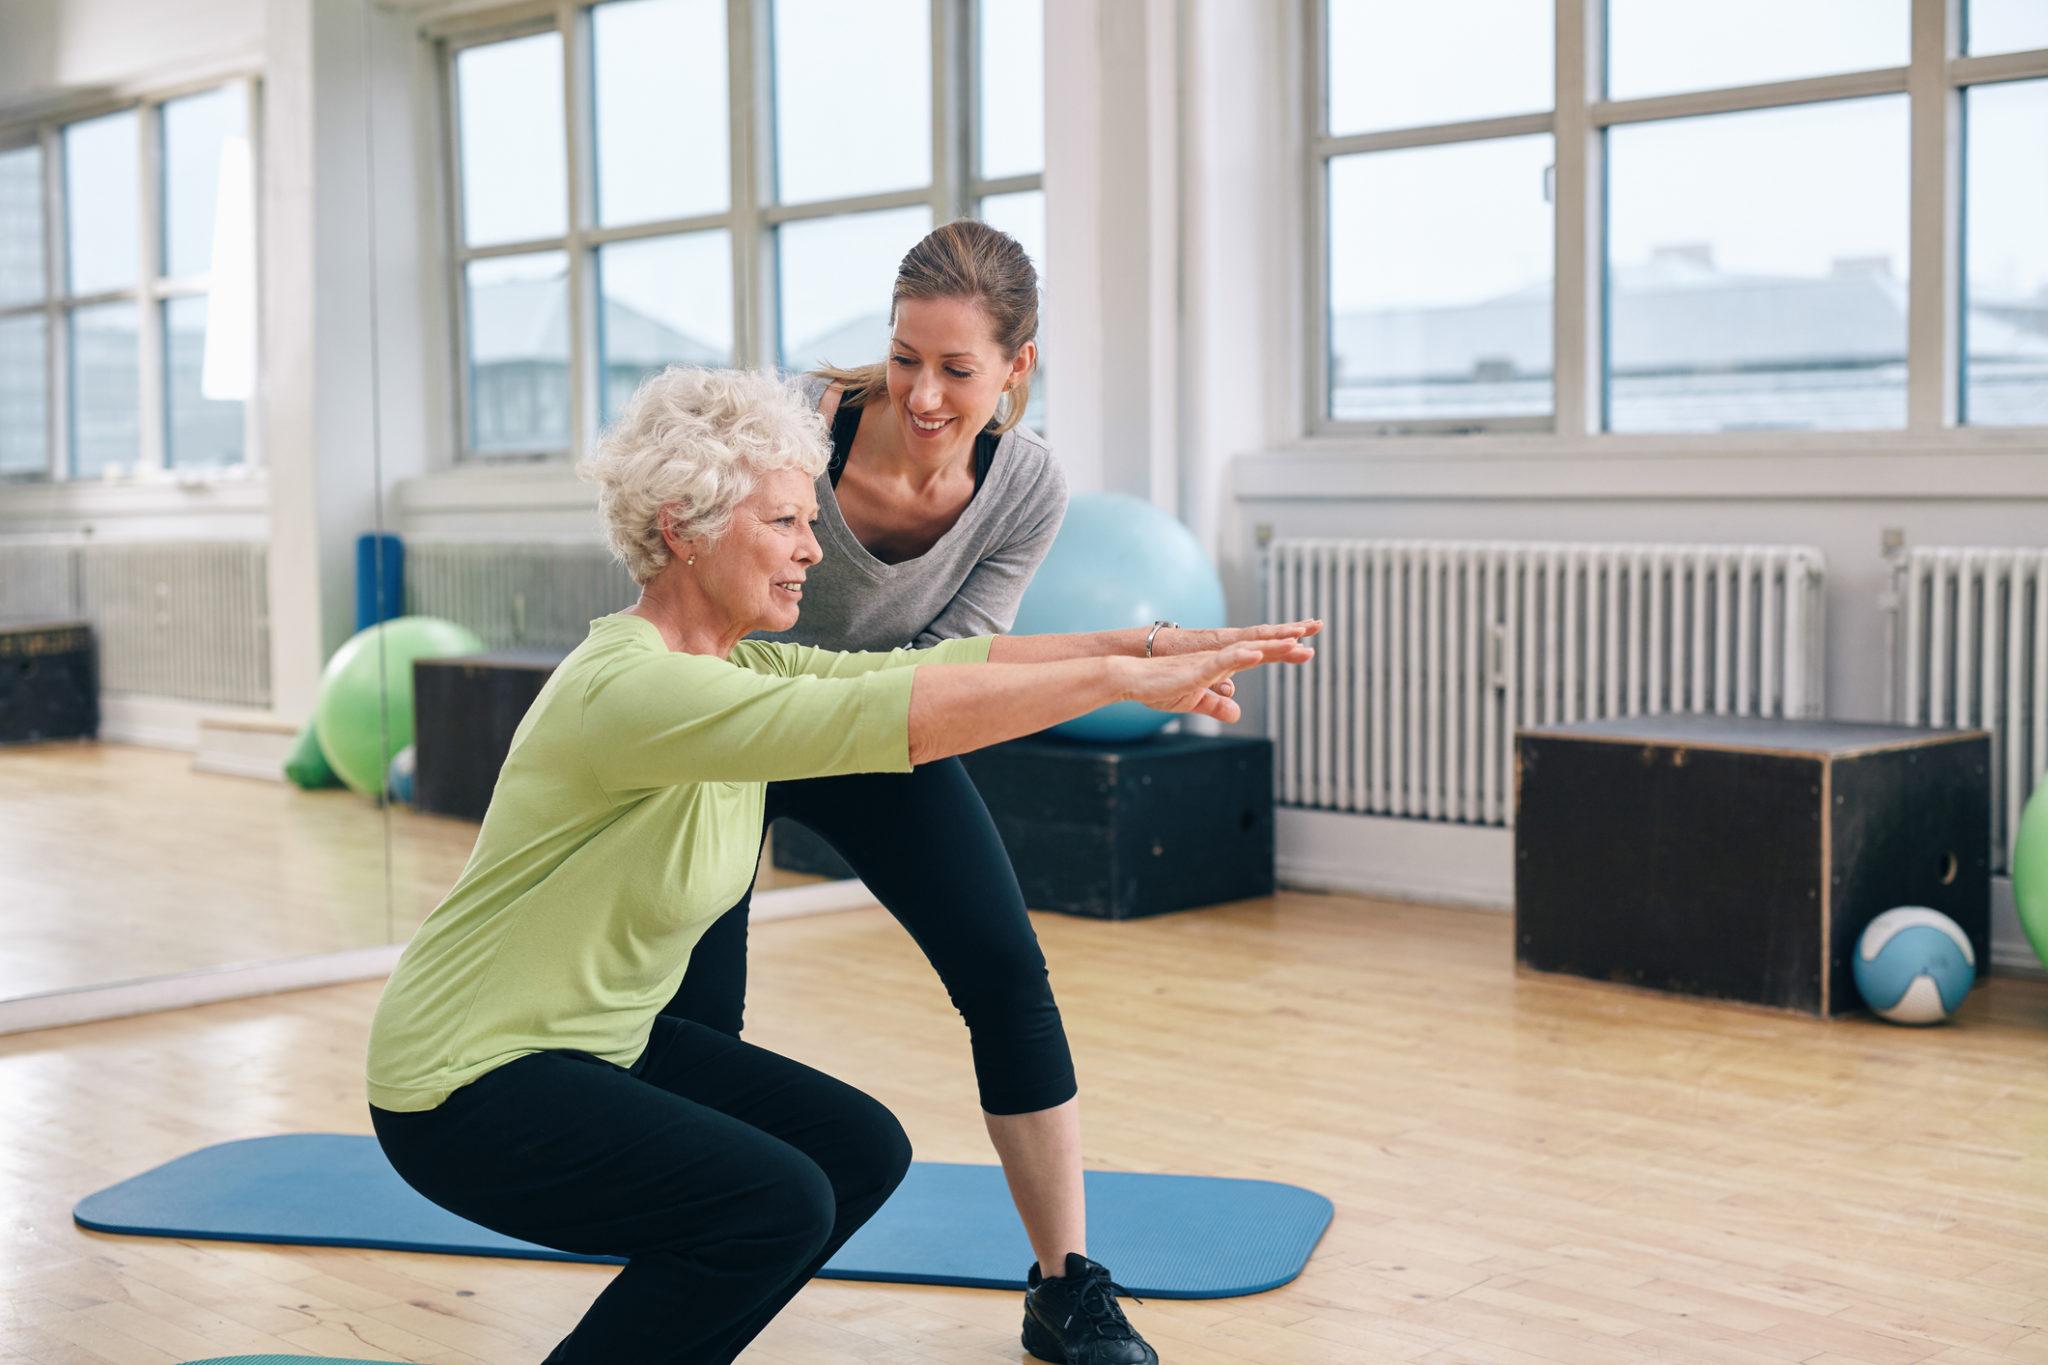 Senior Fitness Certification Training By Neta